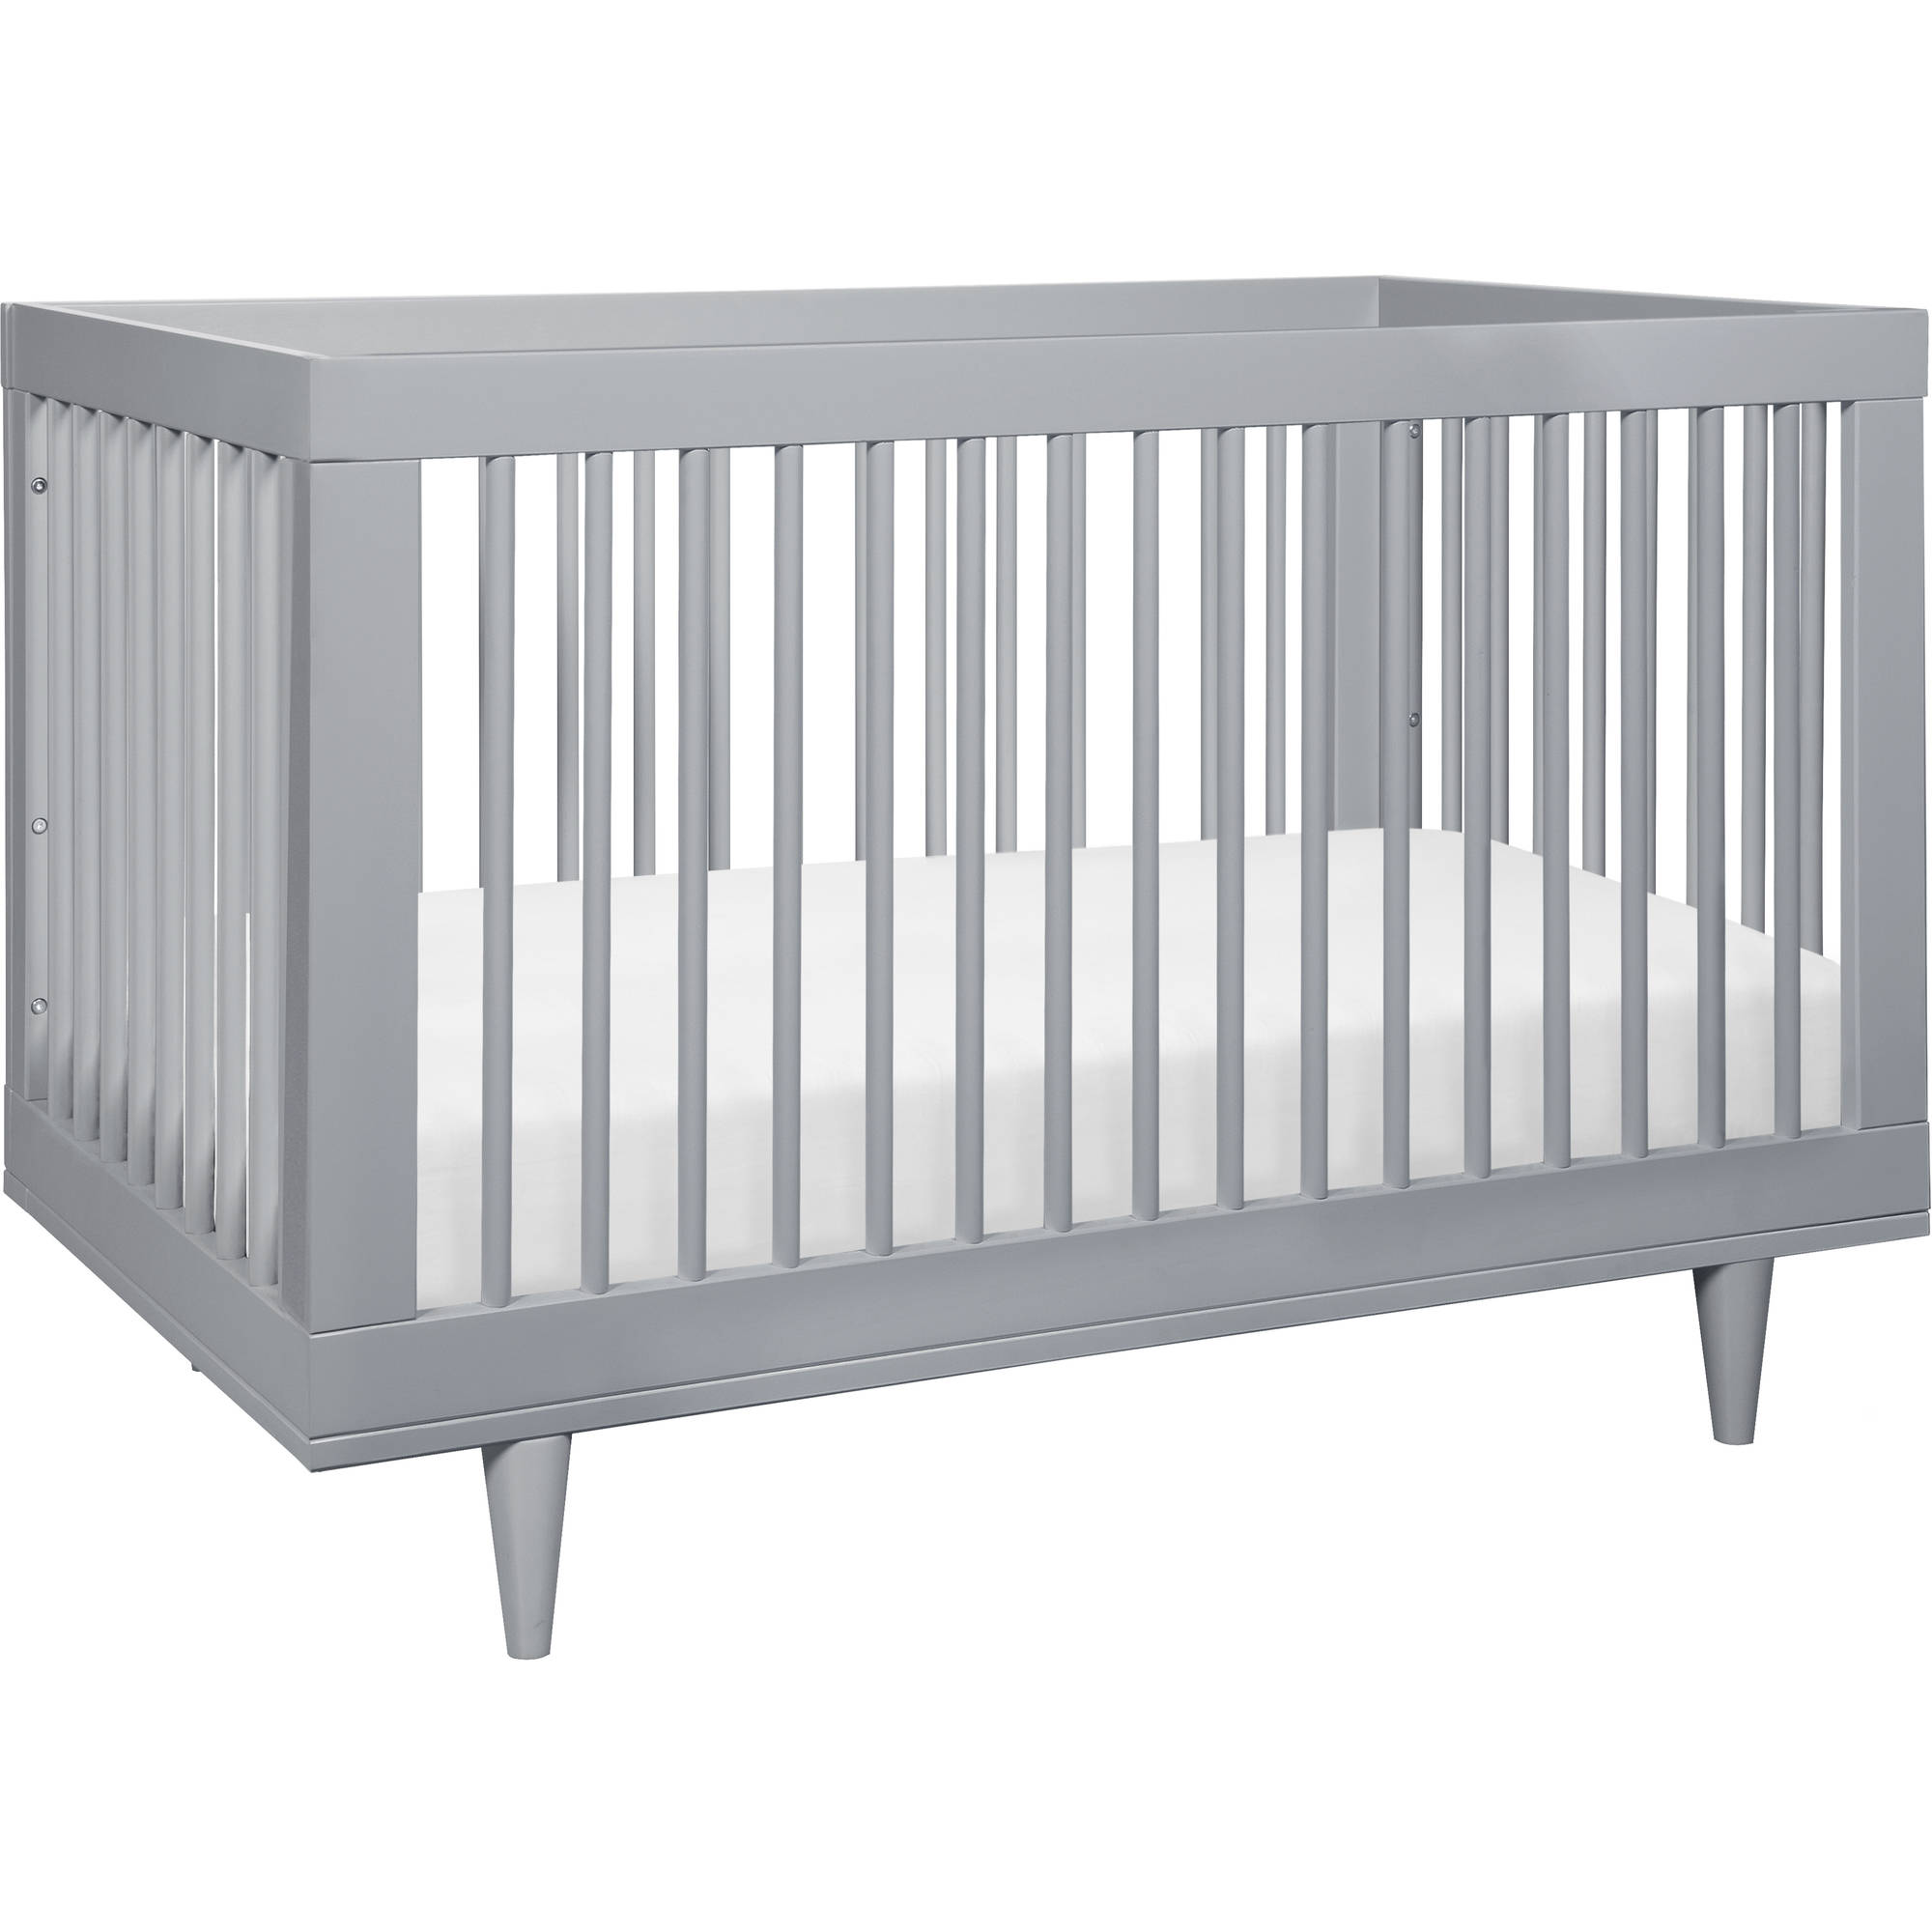 Baby Mod Marley 3-in-1 Convertible Crib Gray